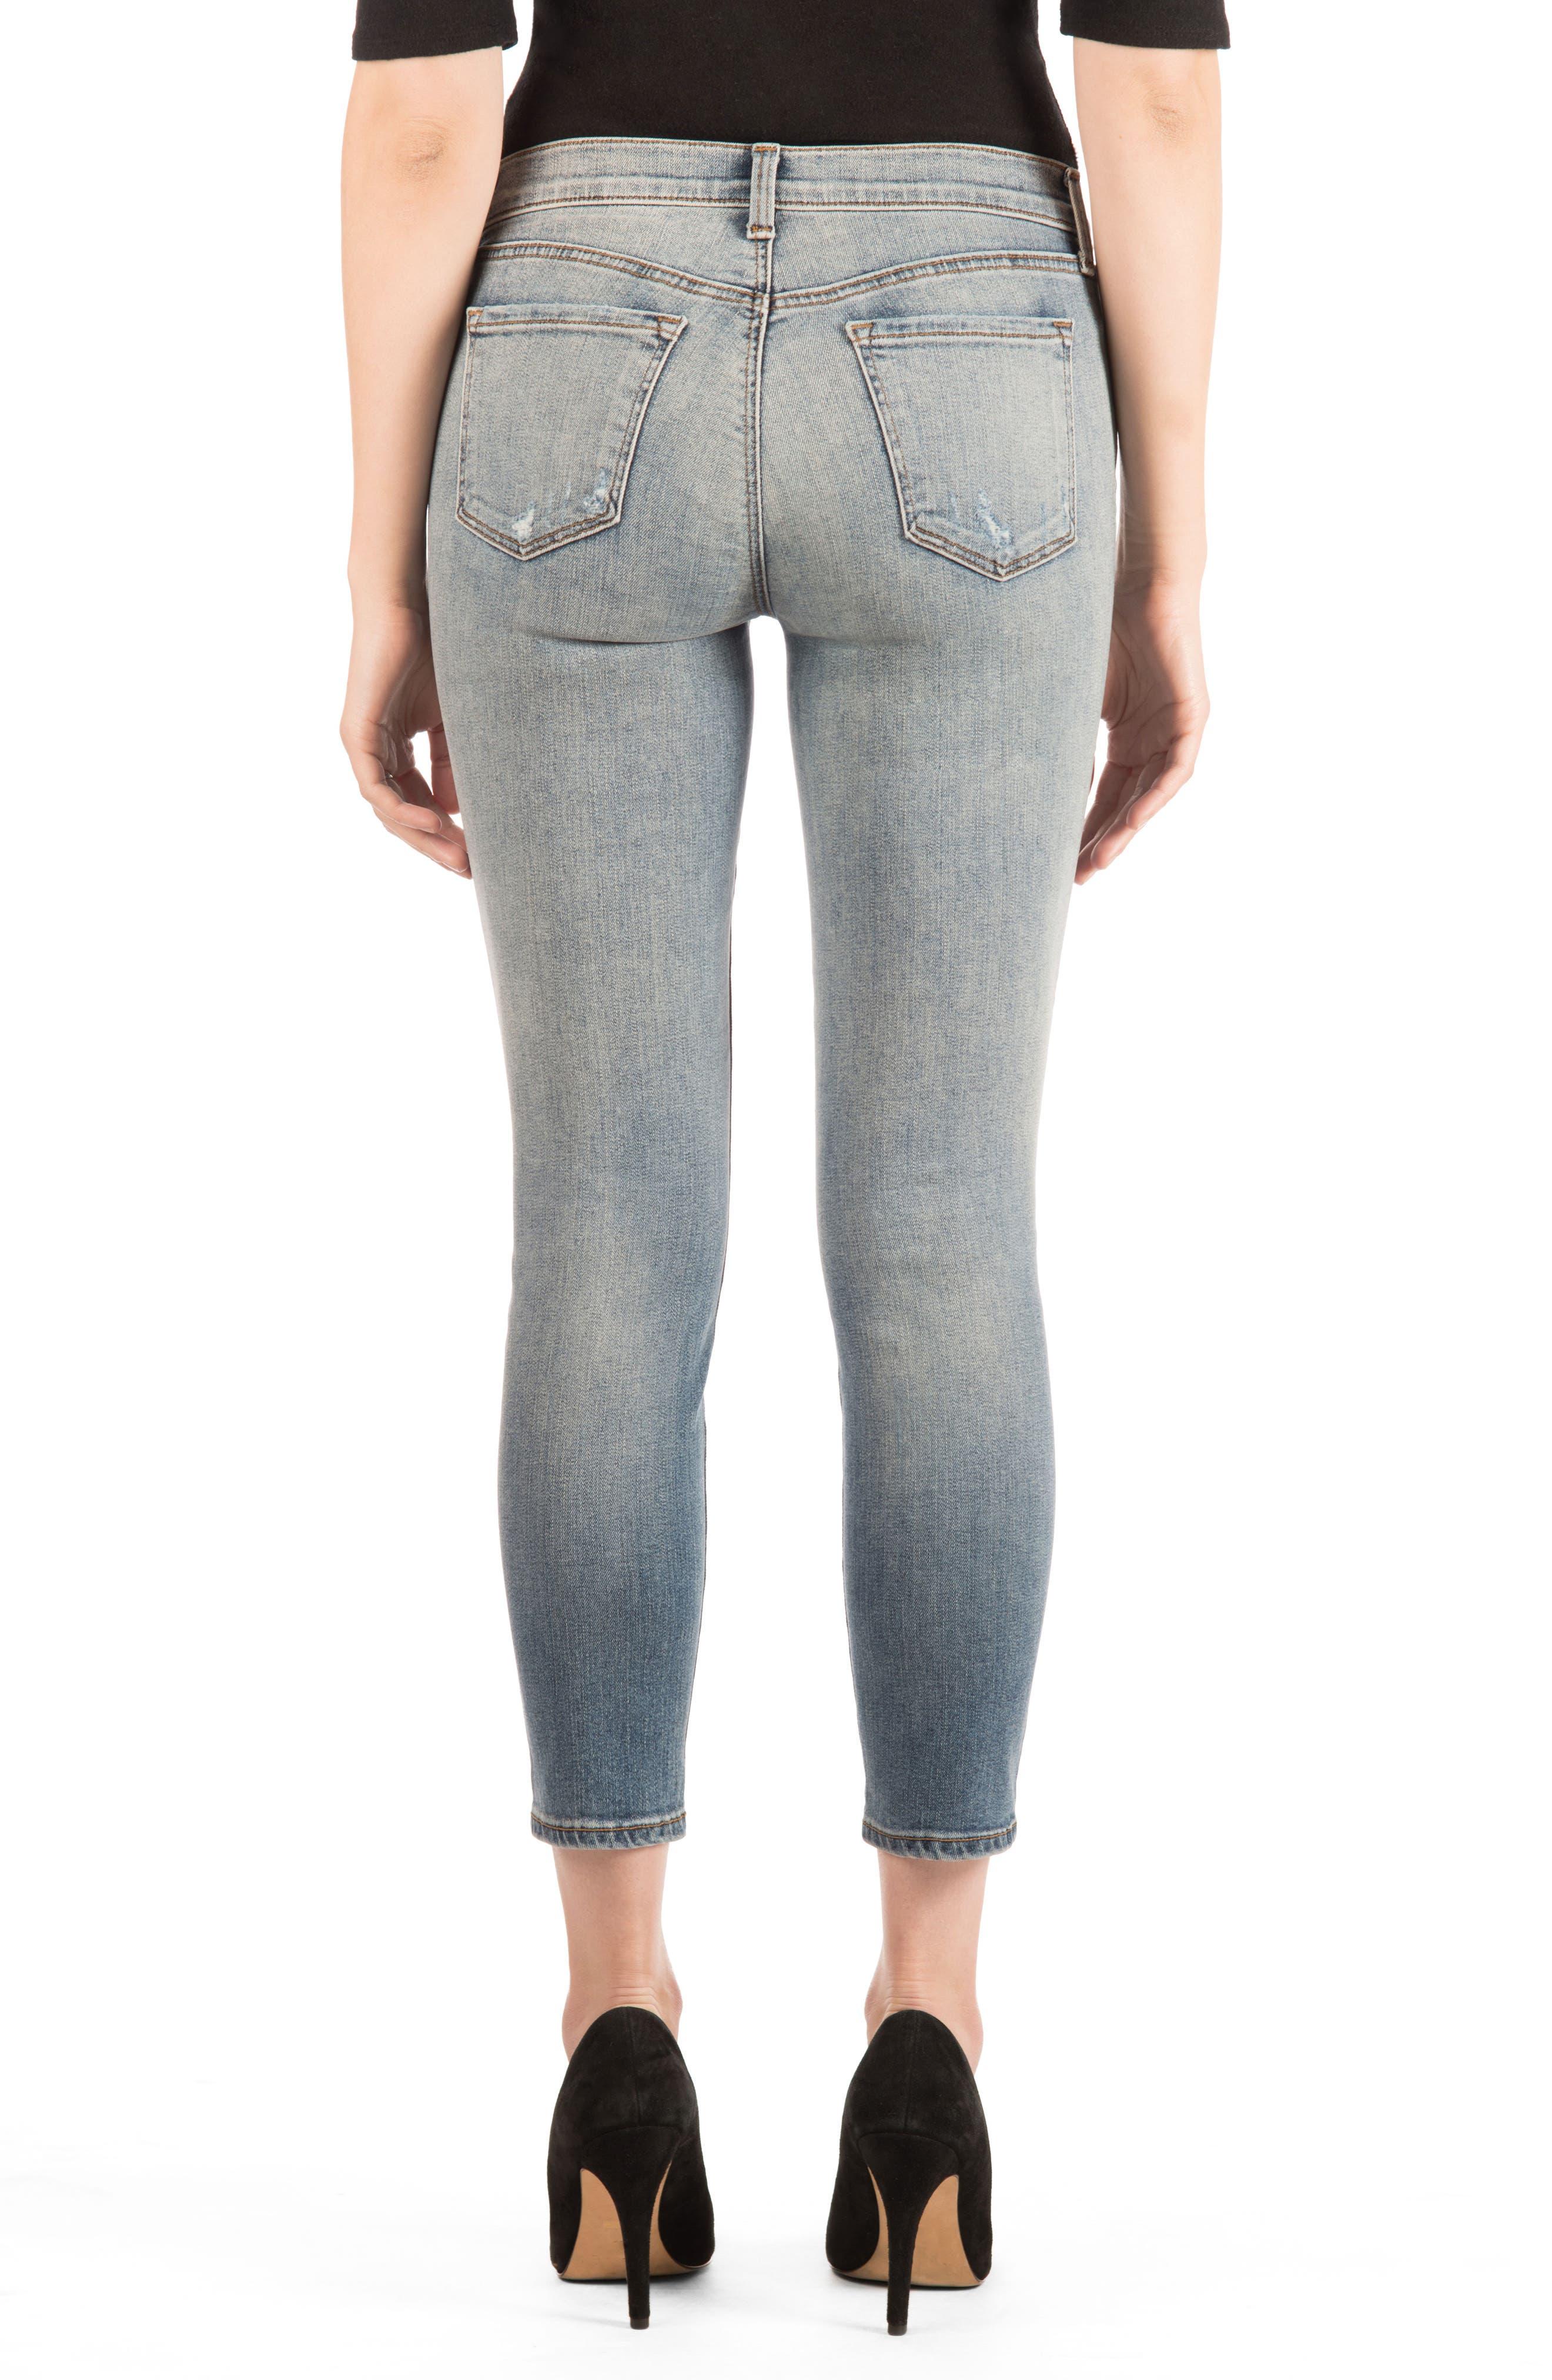 835 Distressed Capri Skinny Jeans,                             Alternate thumbnail 2, color,                             Nolita